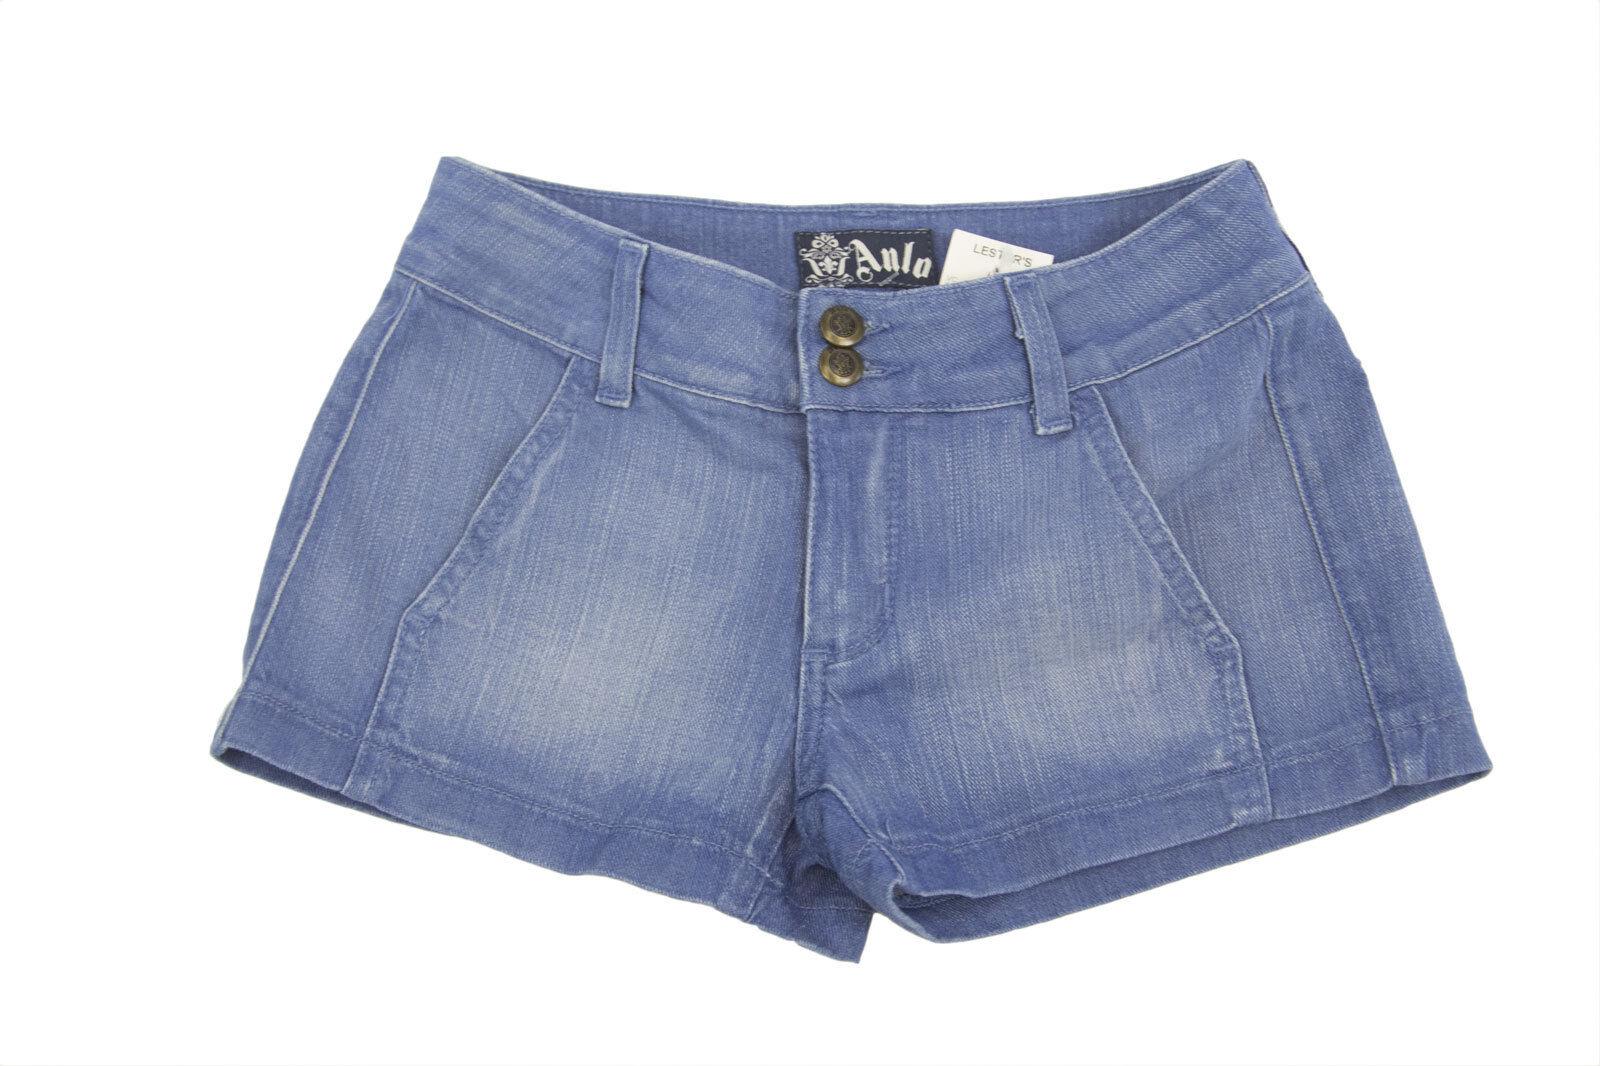 ANLO Women's Montauk Denim Shorts HS7003 Sz 25  165 NWT